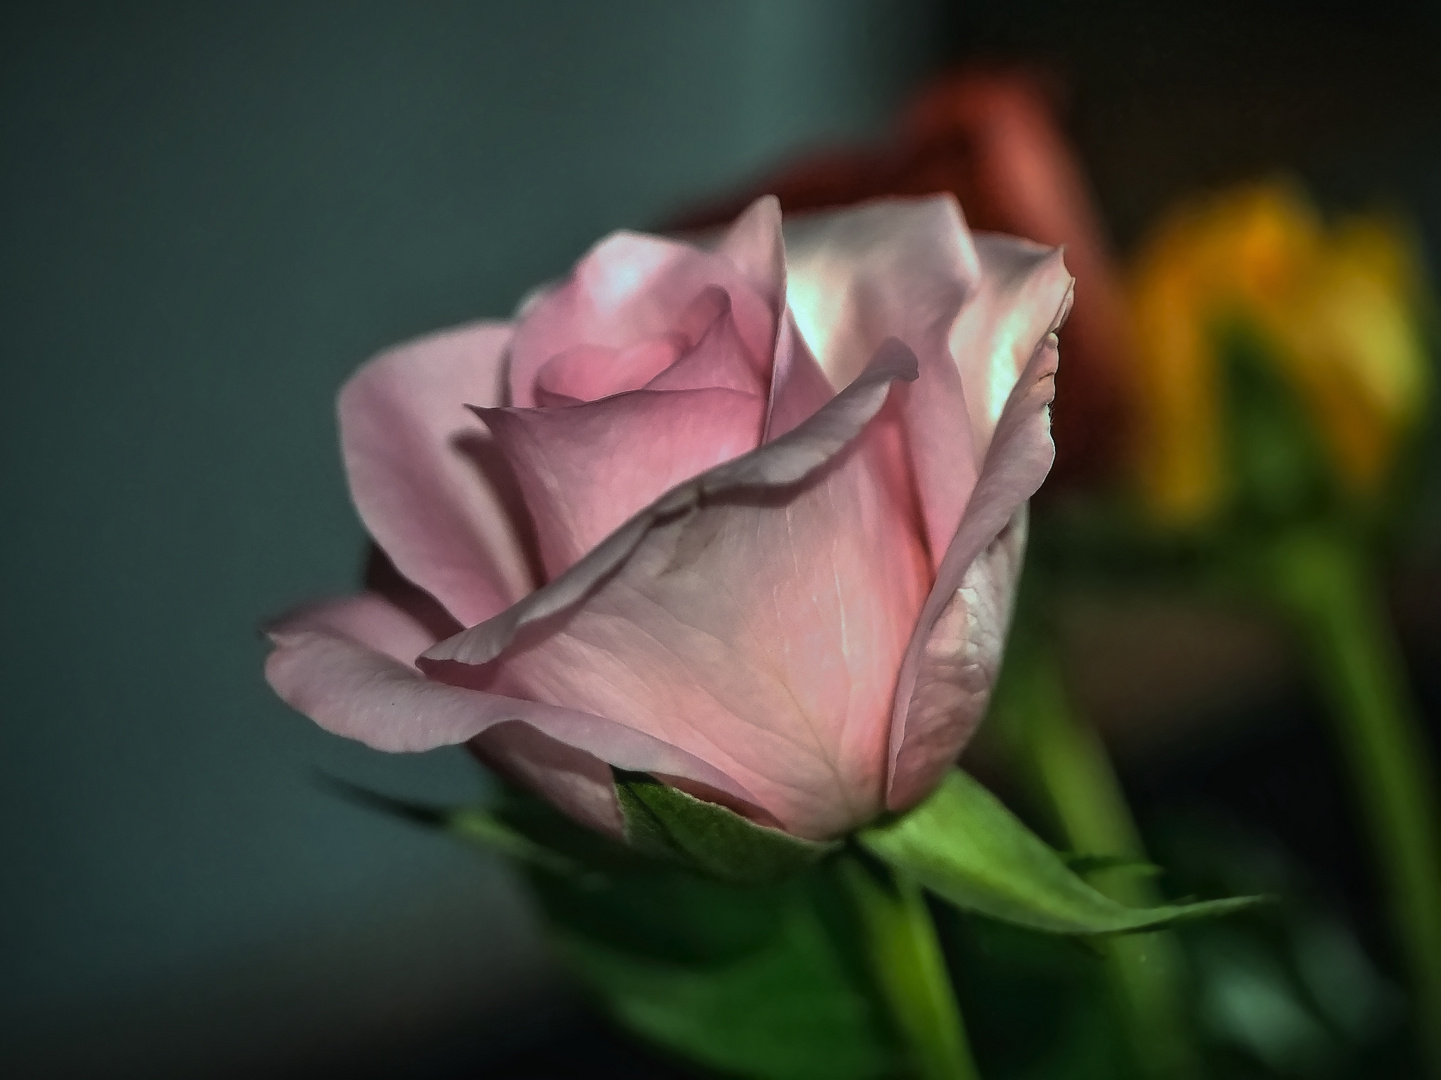 Rosenportrait einer rosaroten Rose